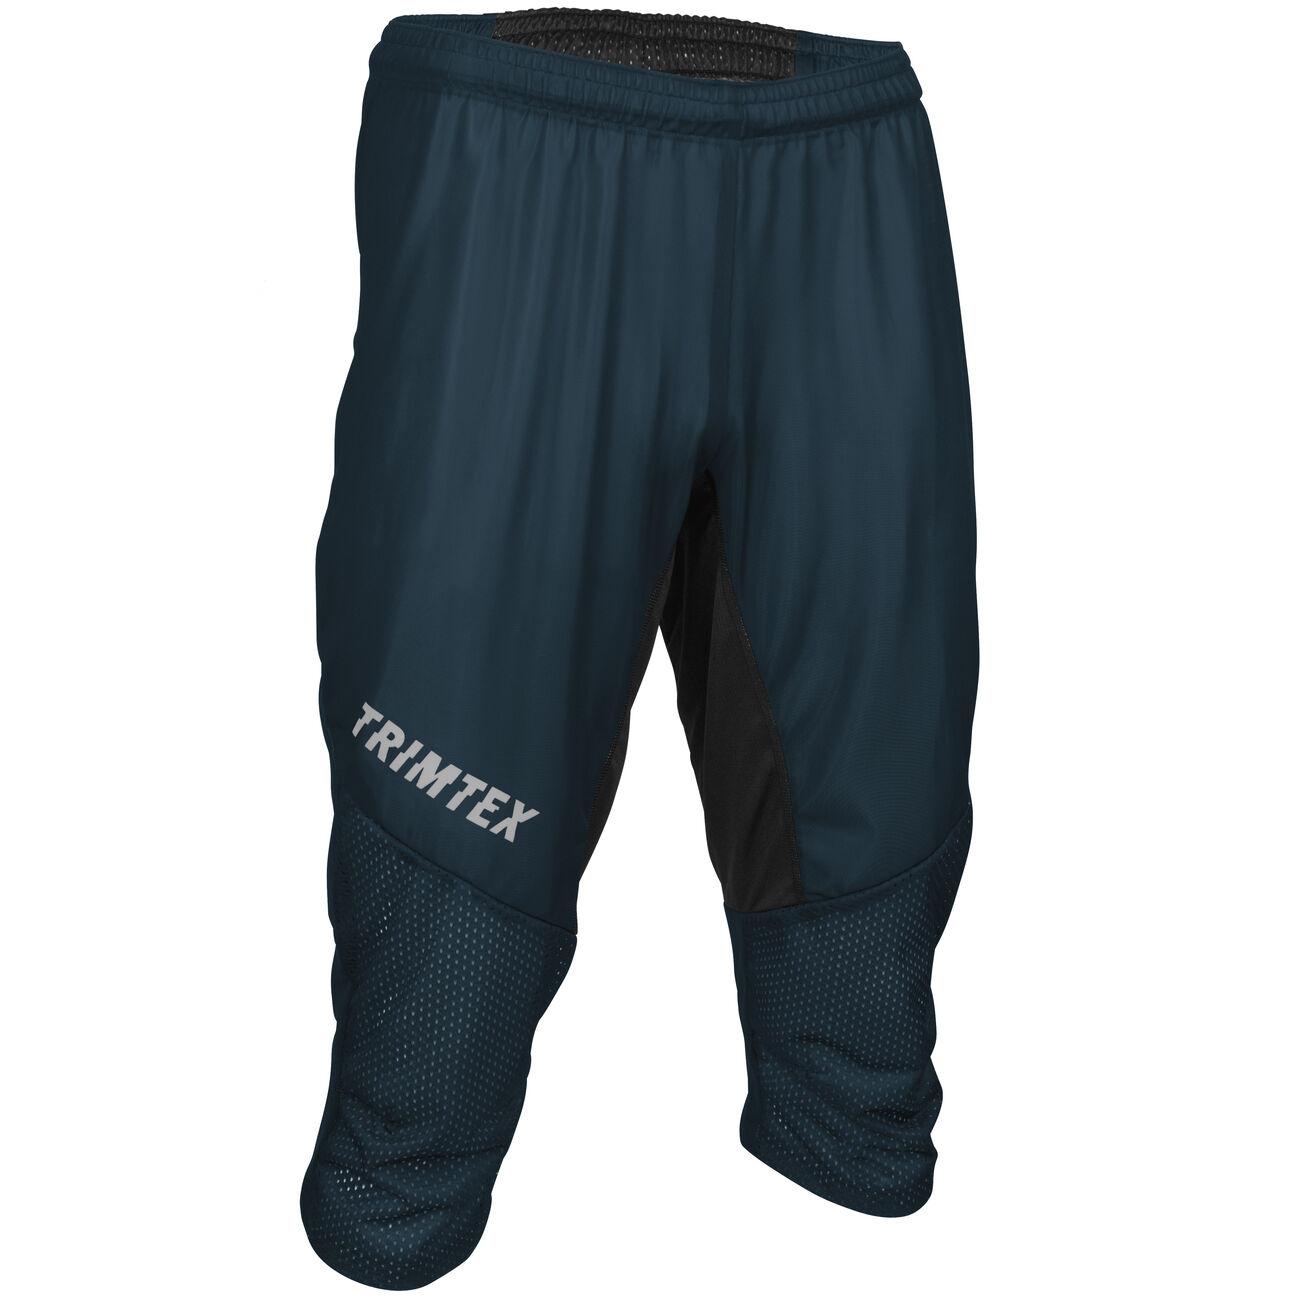 Trail Junior o-pants